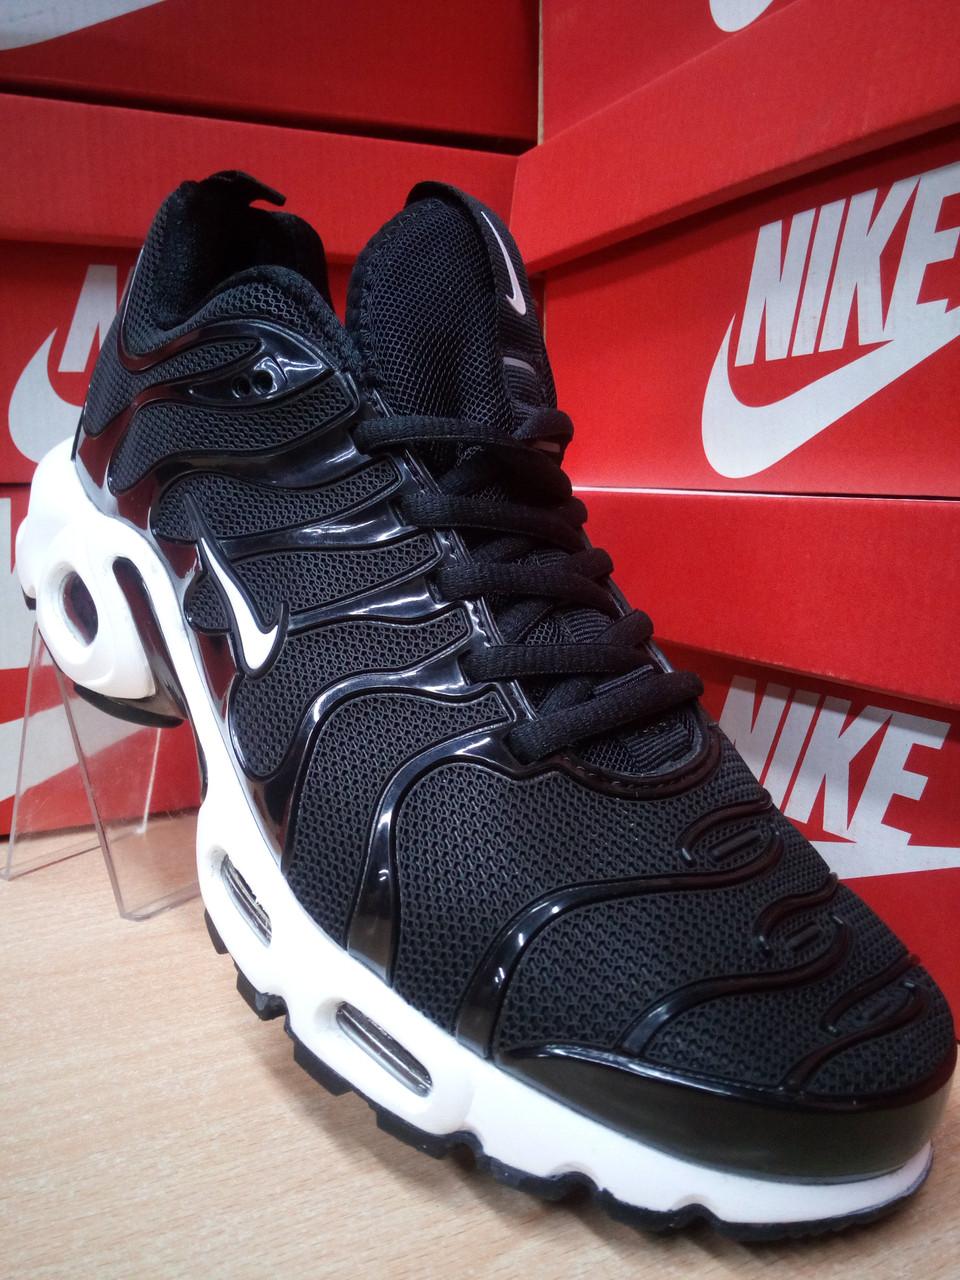 4606b970 ... Мужские кроссовки Найк Аир Макс Тн Плюс/Nike Air Max Tn Plus , фото 4  ...